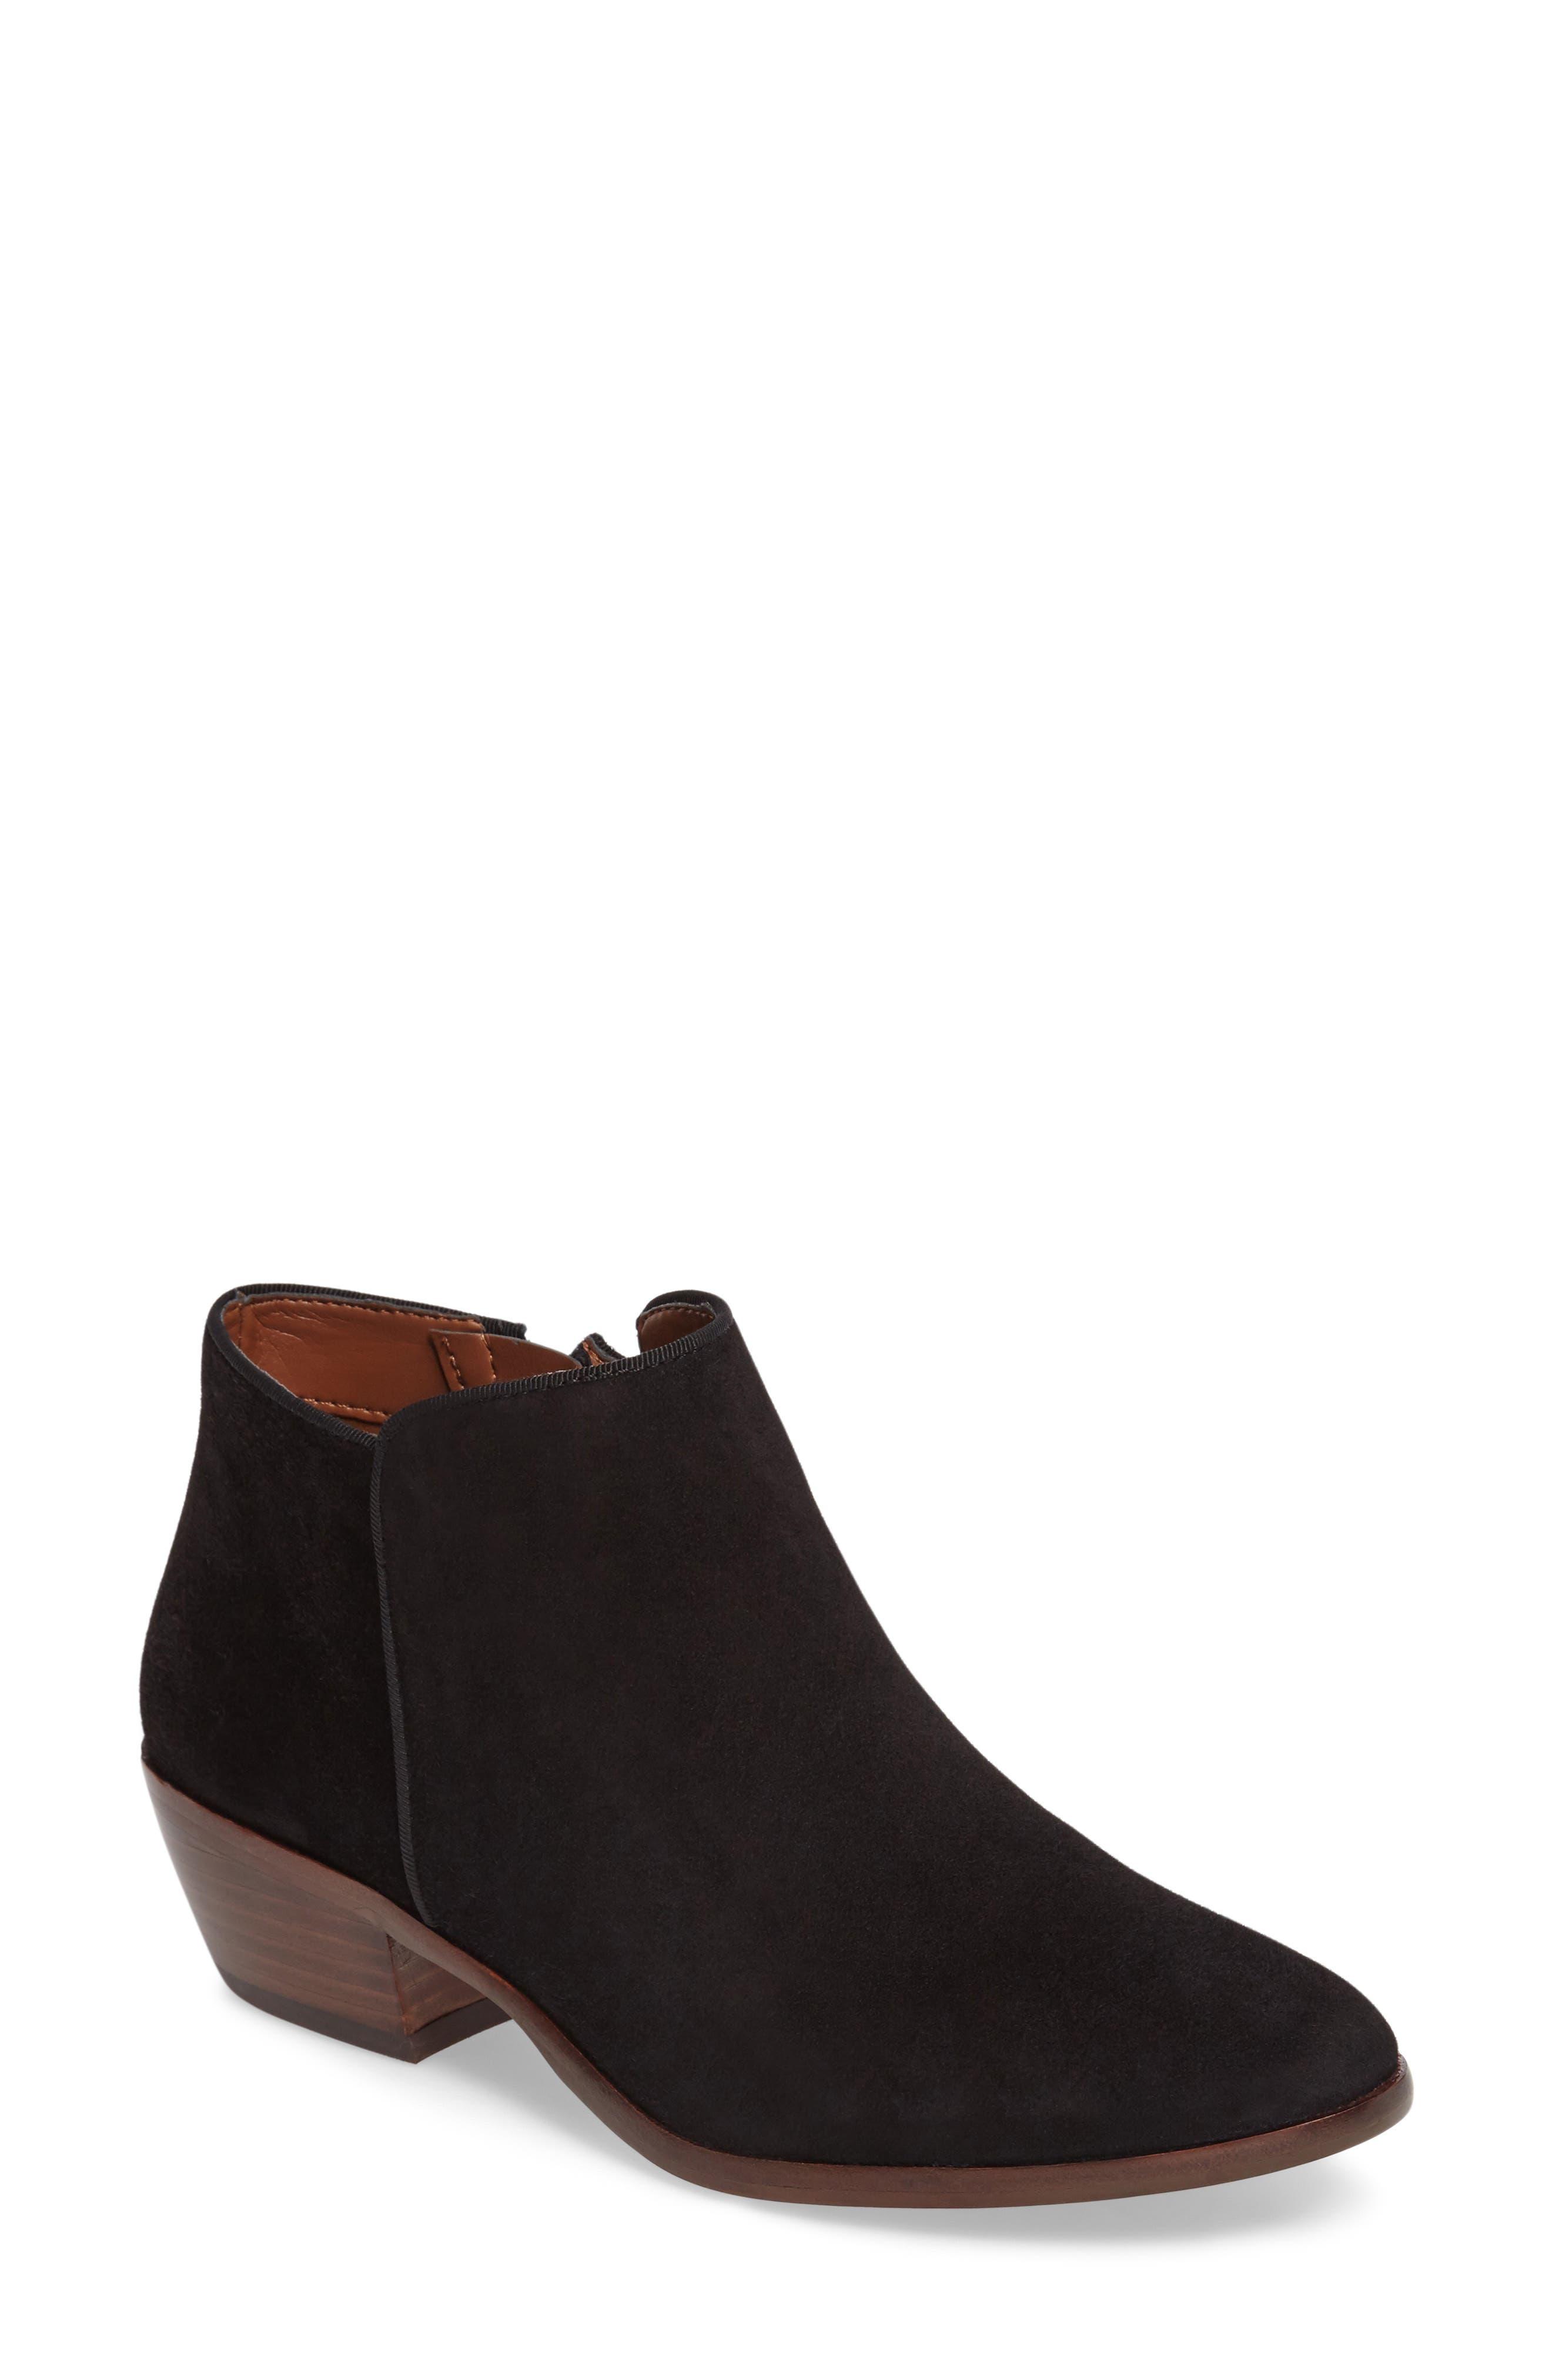 5ab46c1856053 Sam Edelman Women s Boots